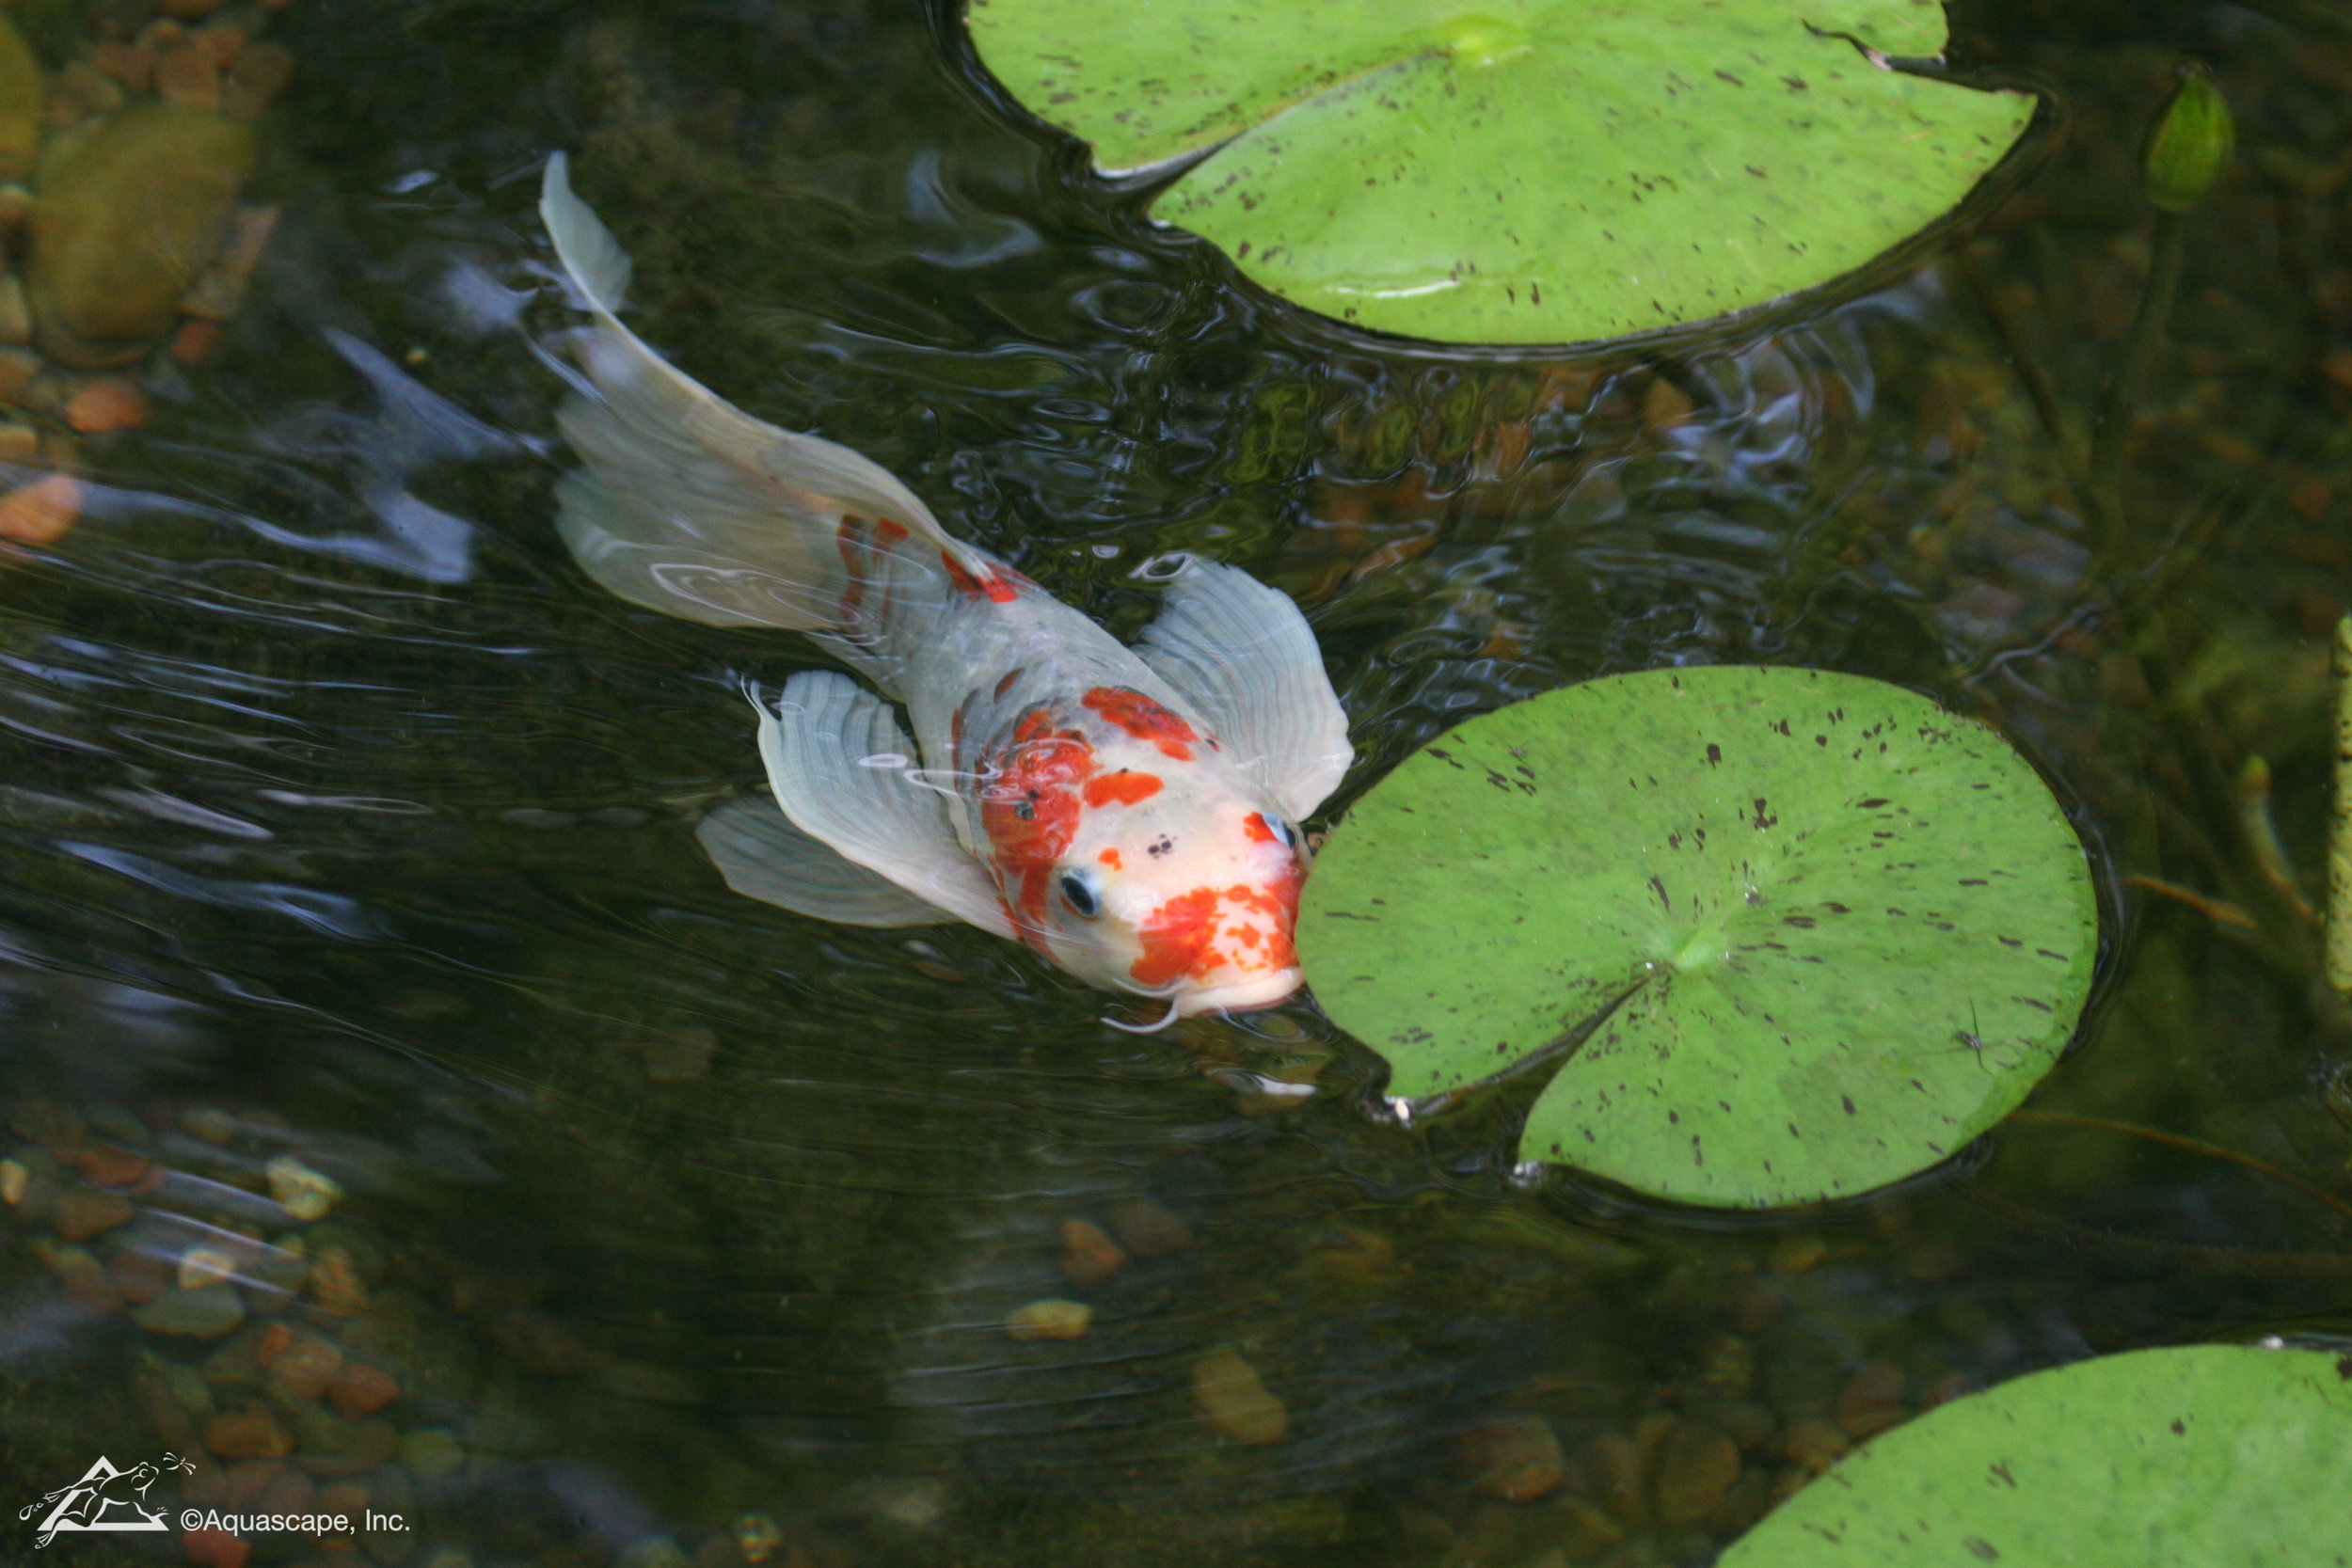 Fish_04.jpg